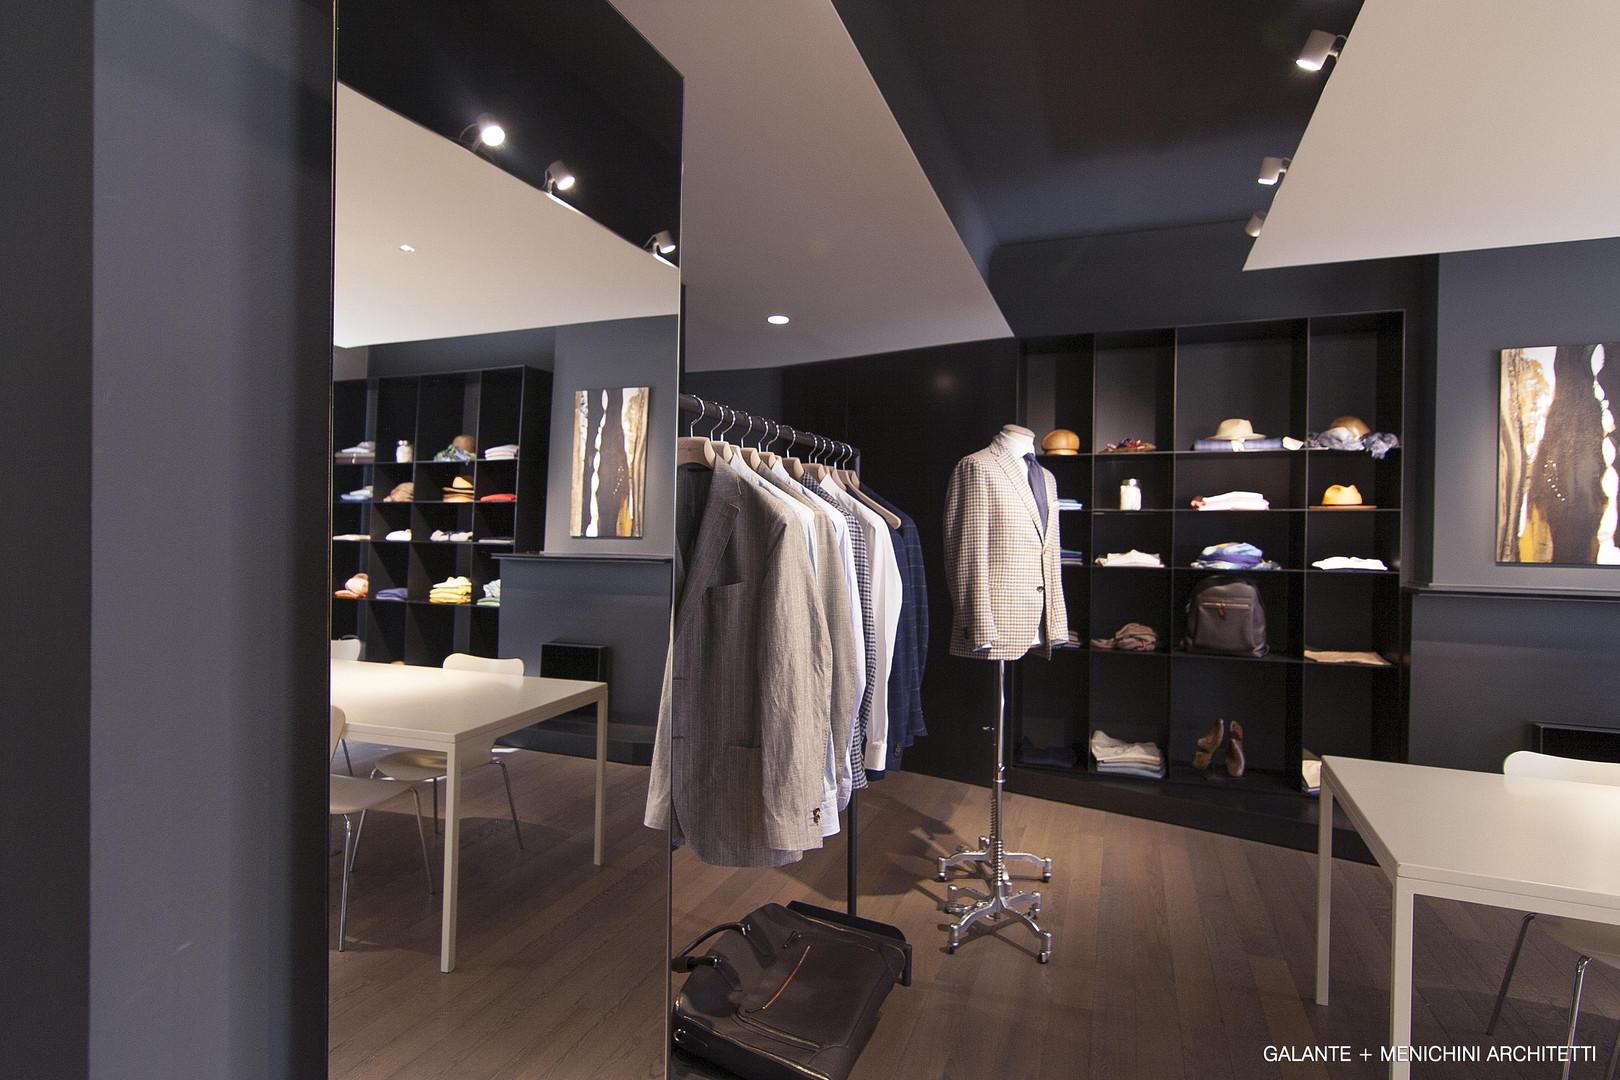 LB_showroom_03_LOW.jpg